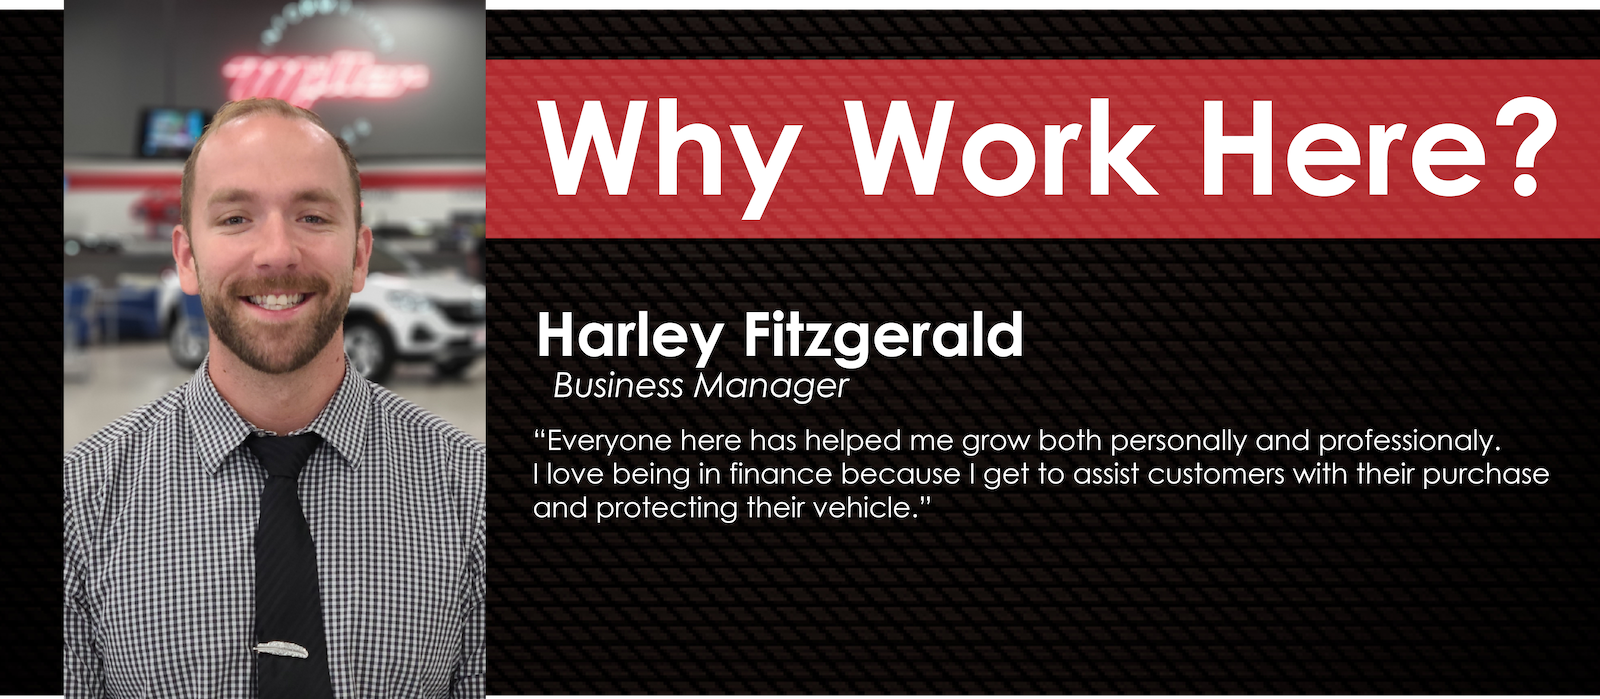 Harley Fitzgerald